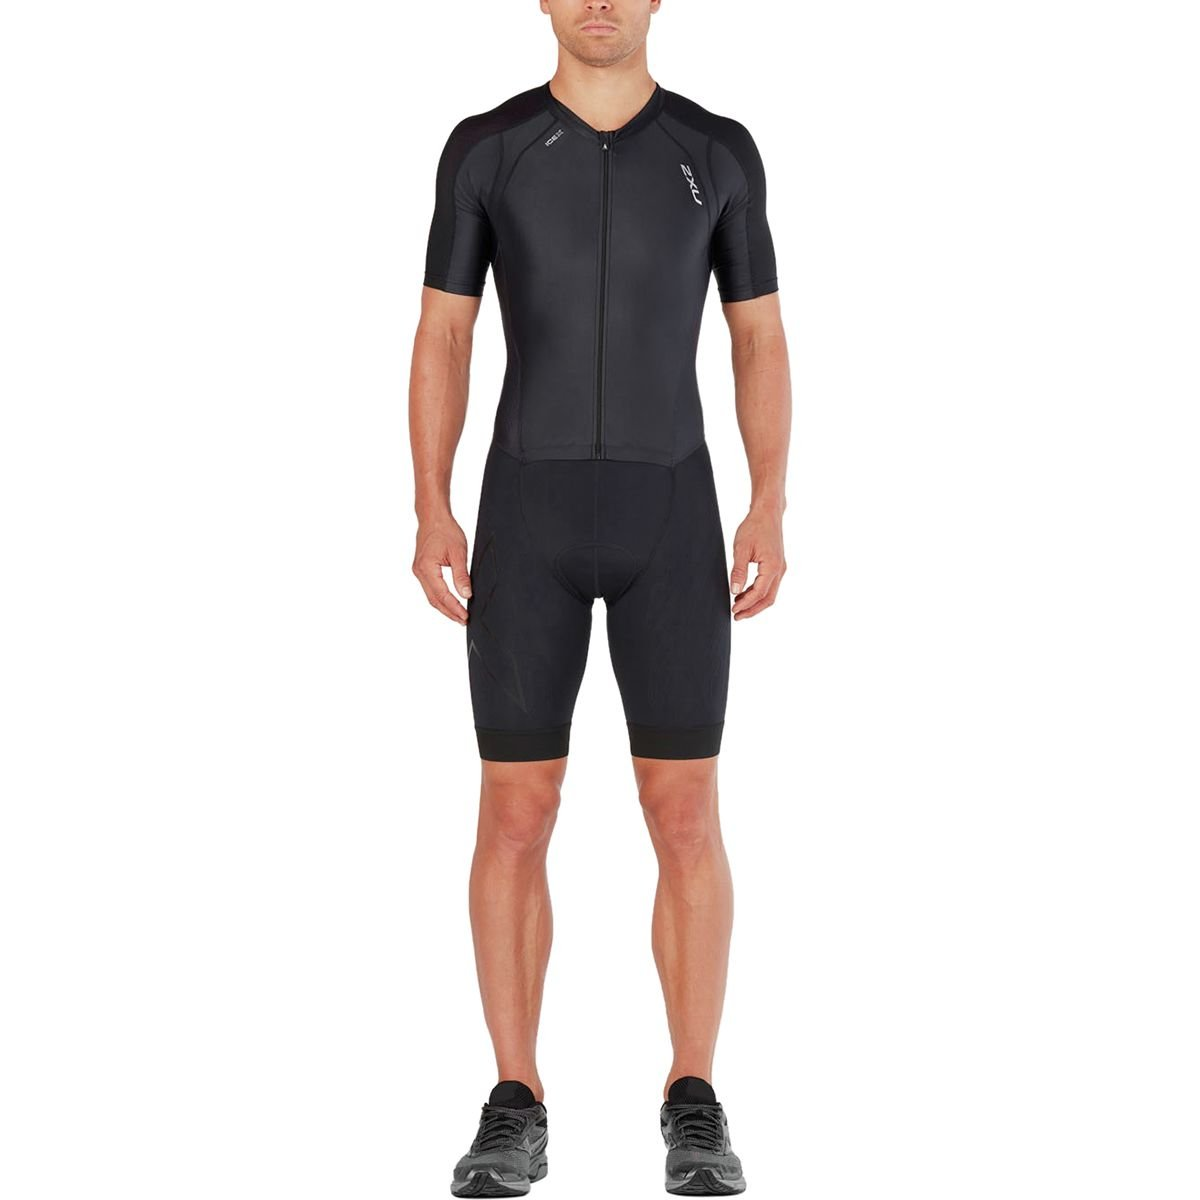 2 x UメンズComp Full Zip Sleeved Trisuit B079FFK89N Large|ブラック/ブラック ブラック/ブラック Large